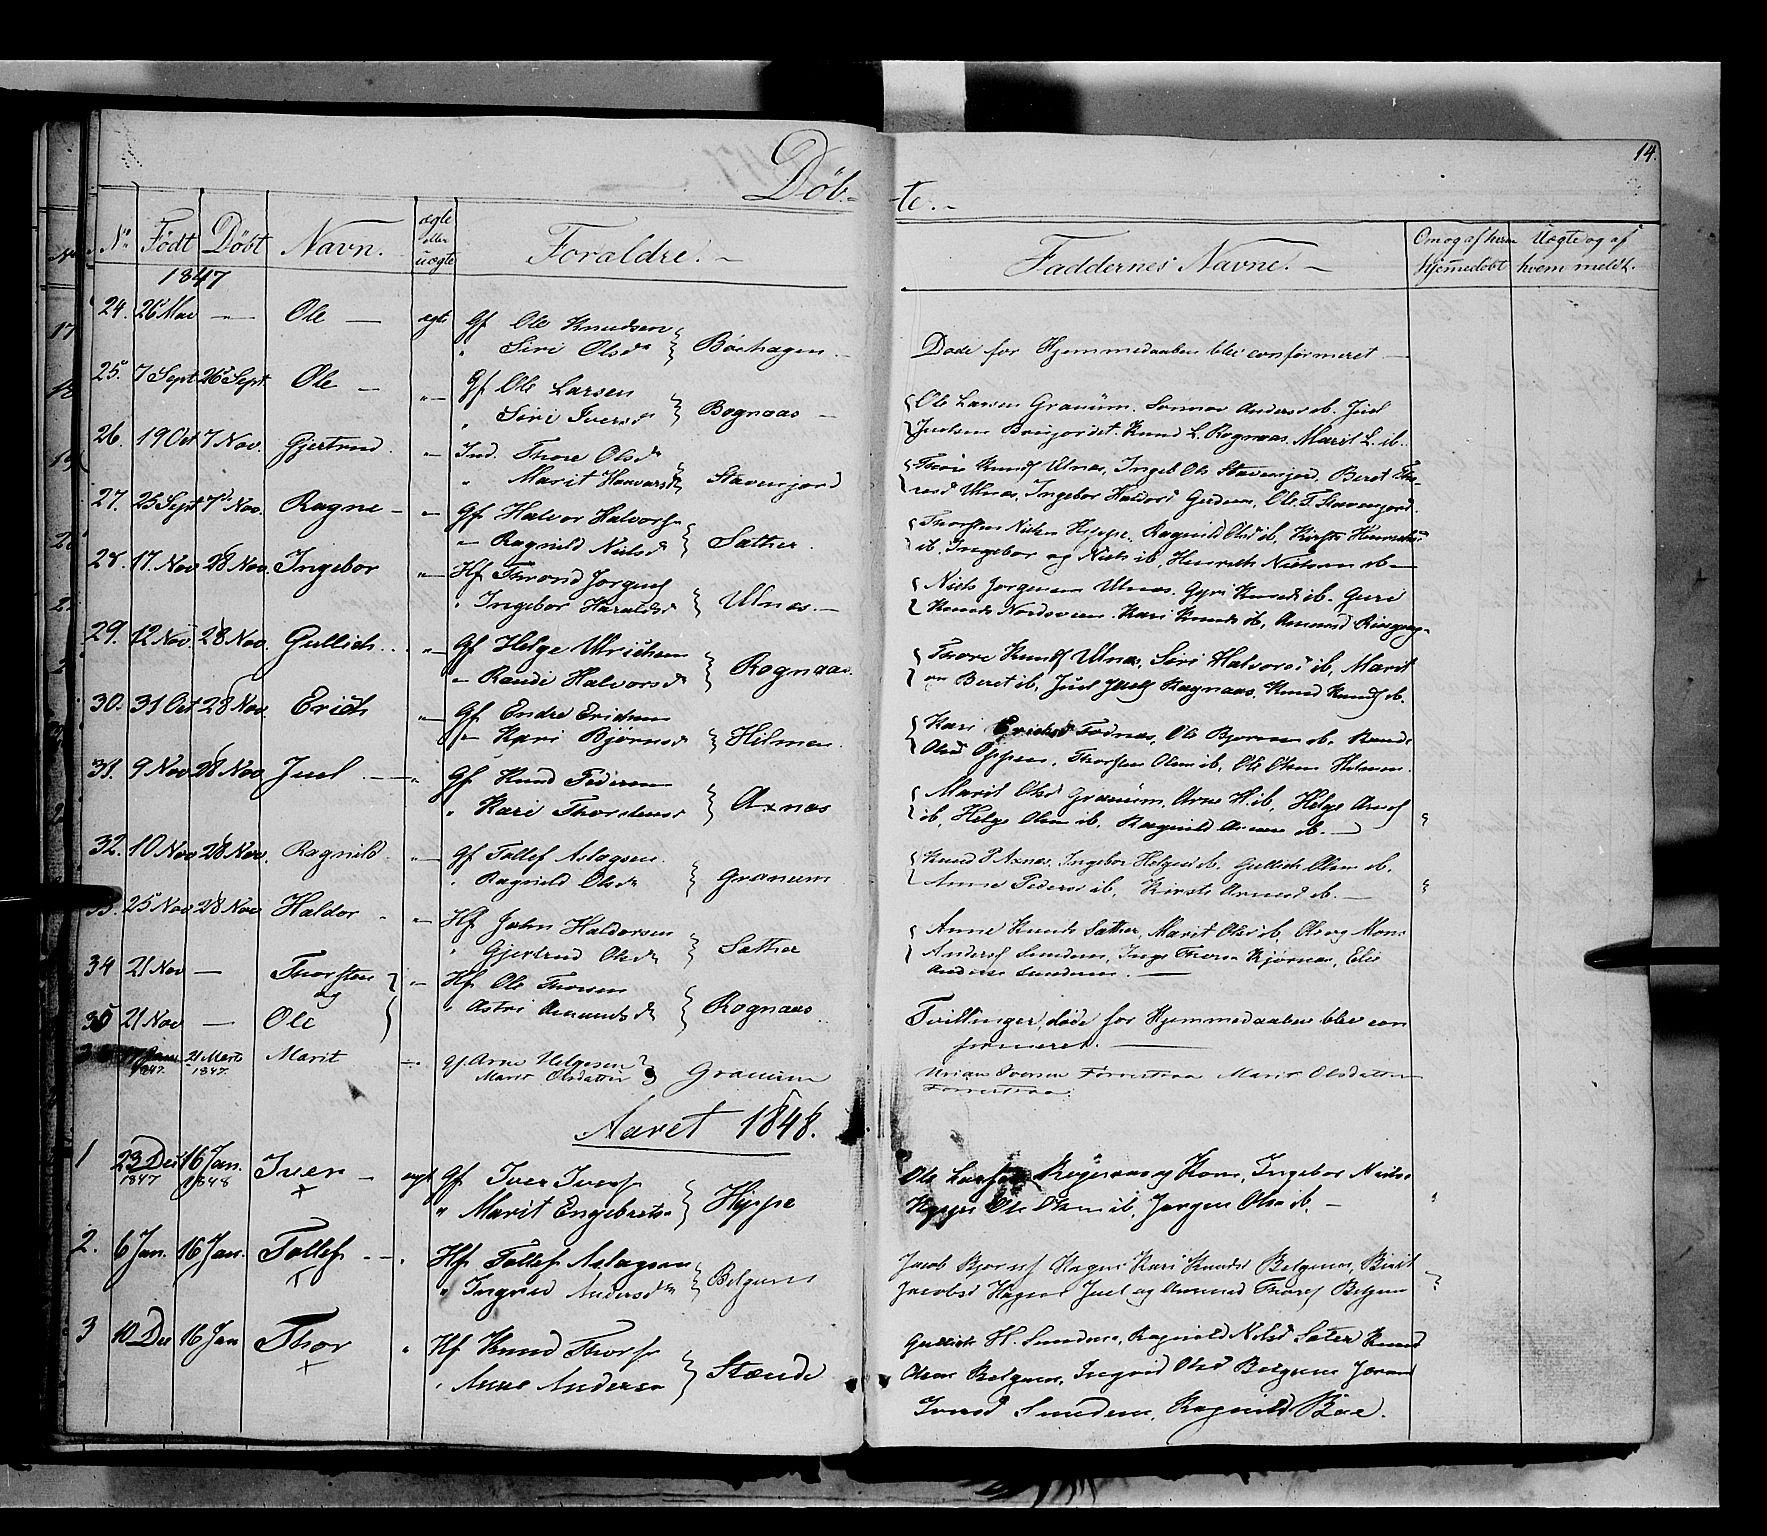 SAH, Nord-Aurdal prestekontor, Ministerialbok nr. 6, 1842-1863, s. 14